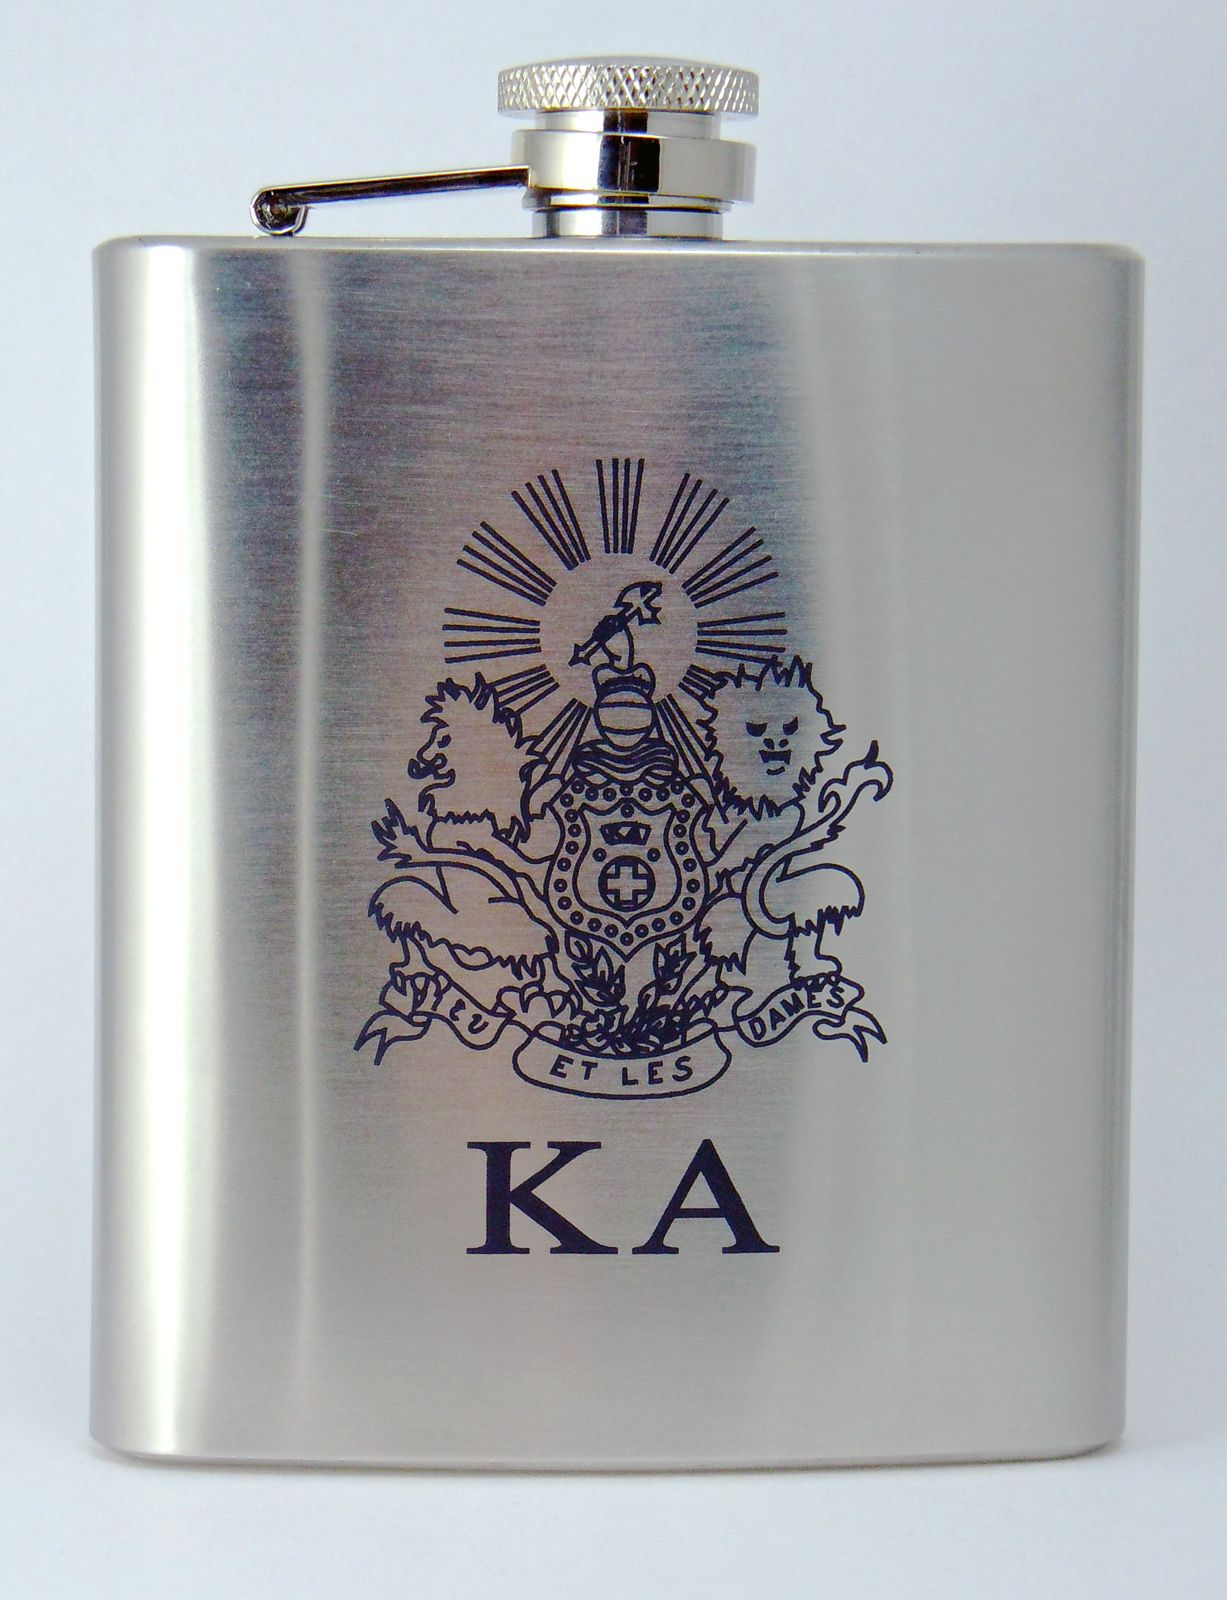 Kappa Alpha Order Laser Engraved Crest Brushed Silver 8 oz. Stainless Steel Flask- for Ian?